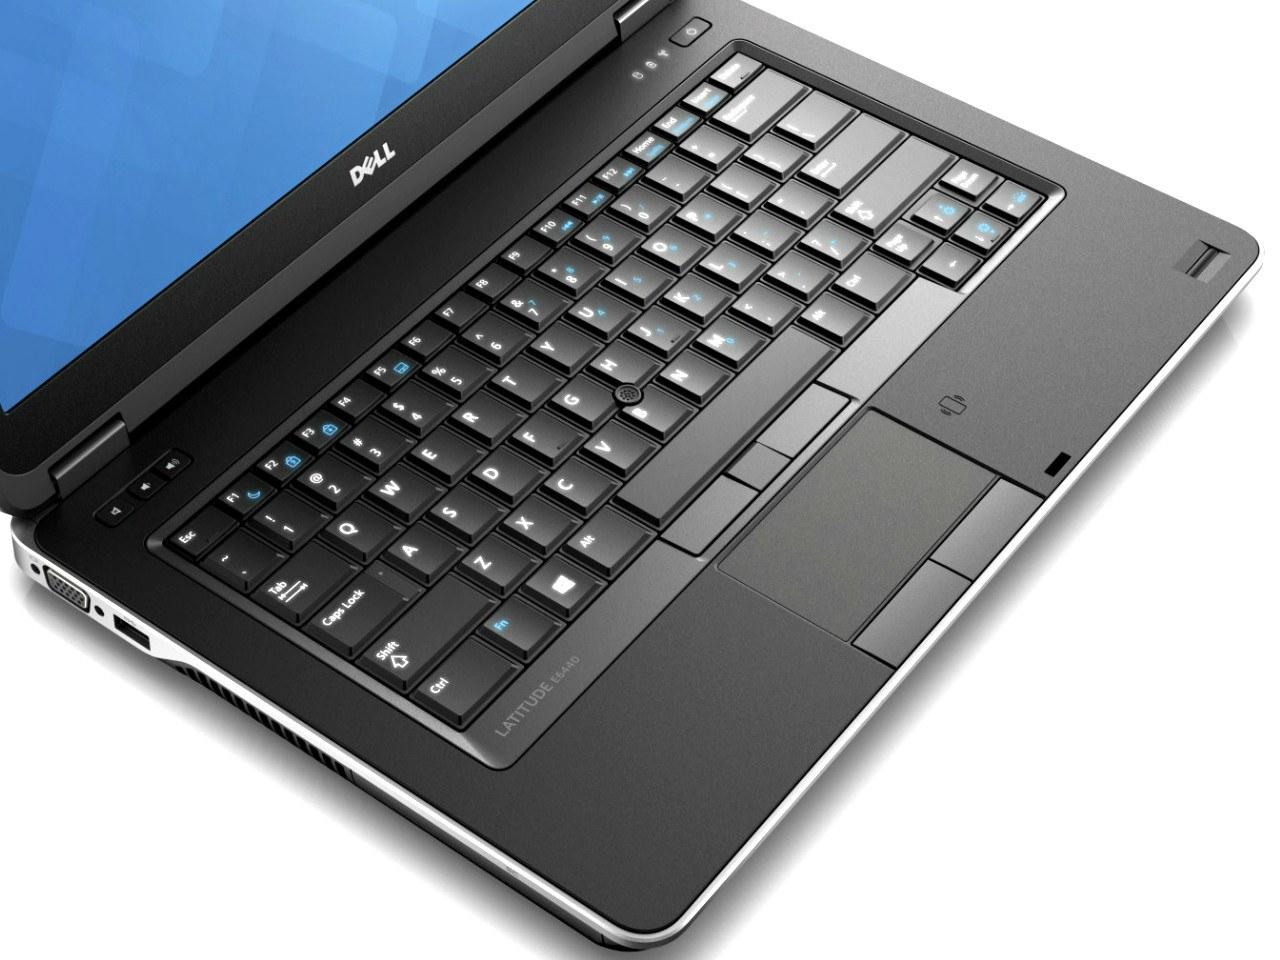 Bàn phím Laptop dell latitude e6440 - Linh kiện laptop Hải Phòng